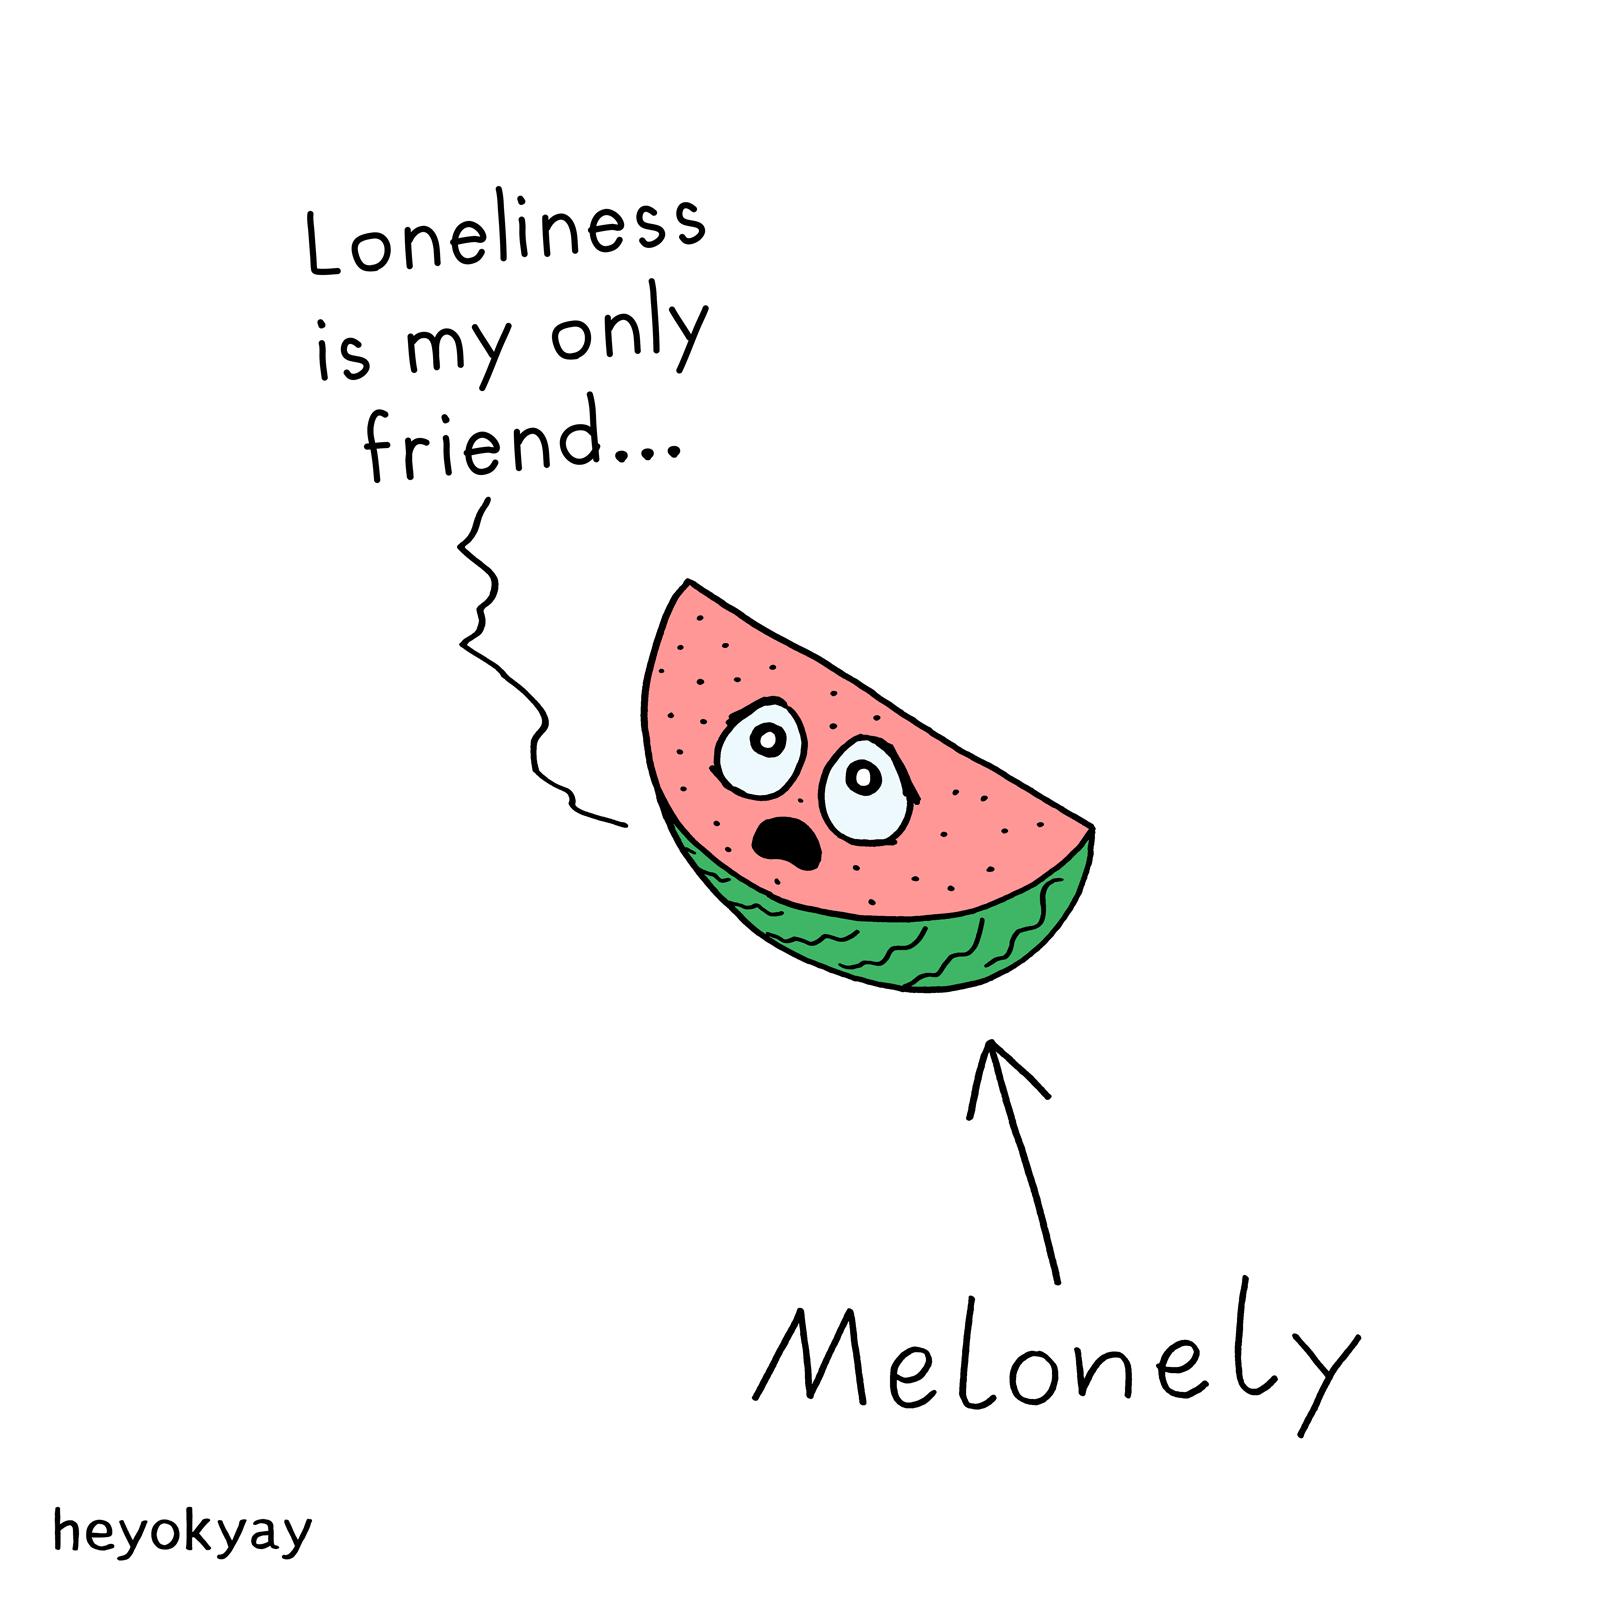 Melonely heyokyay comic